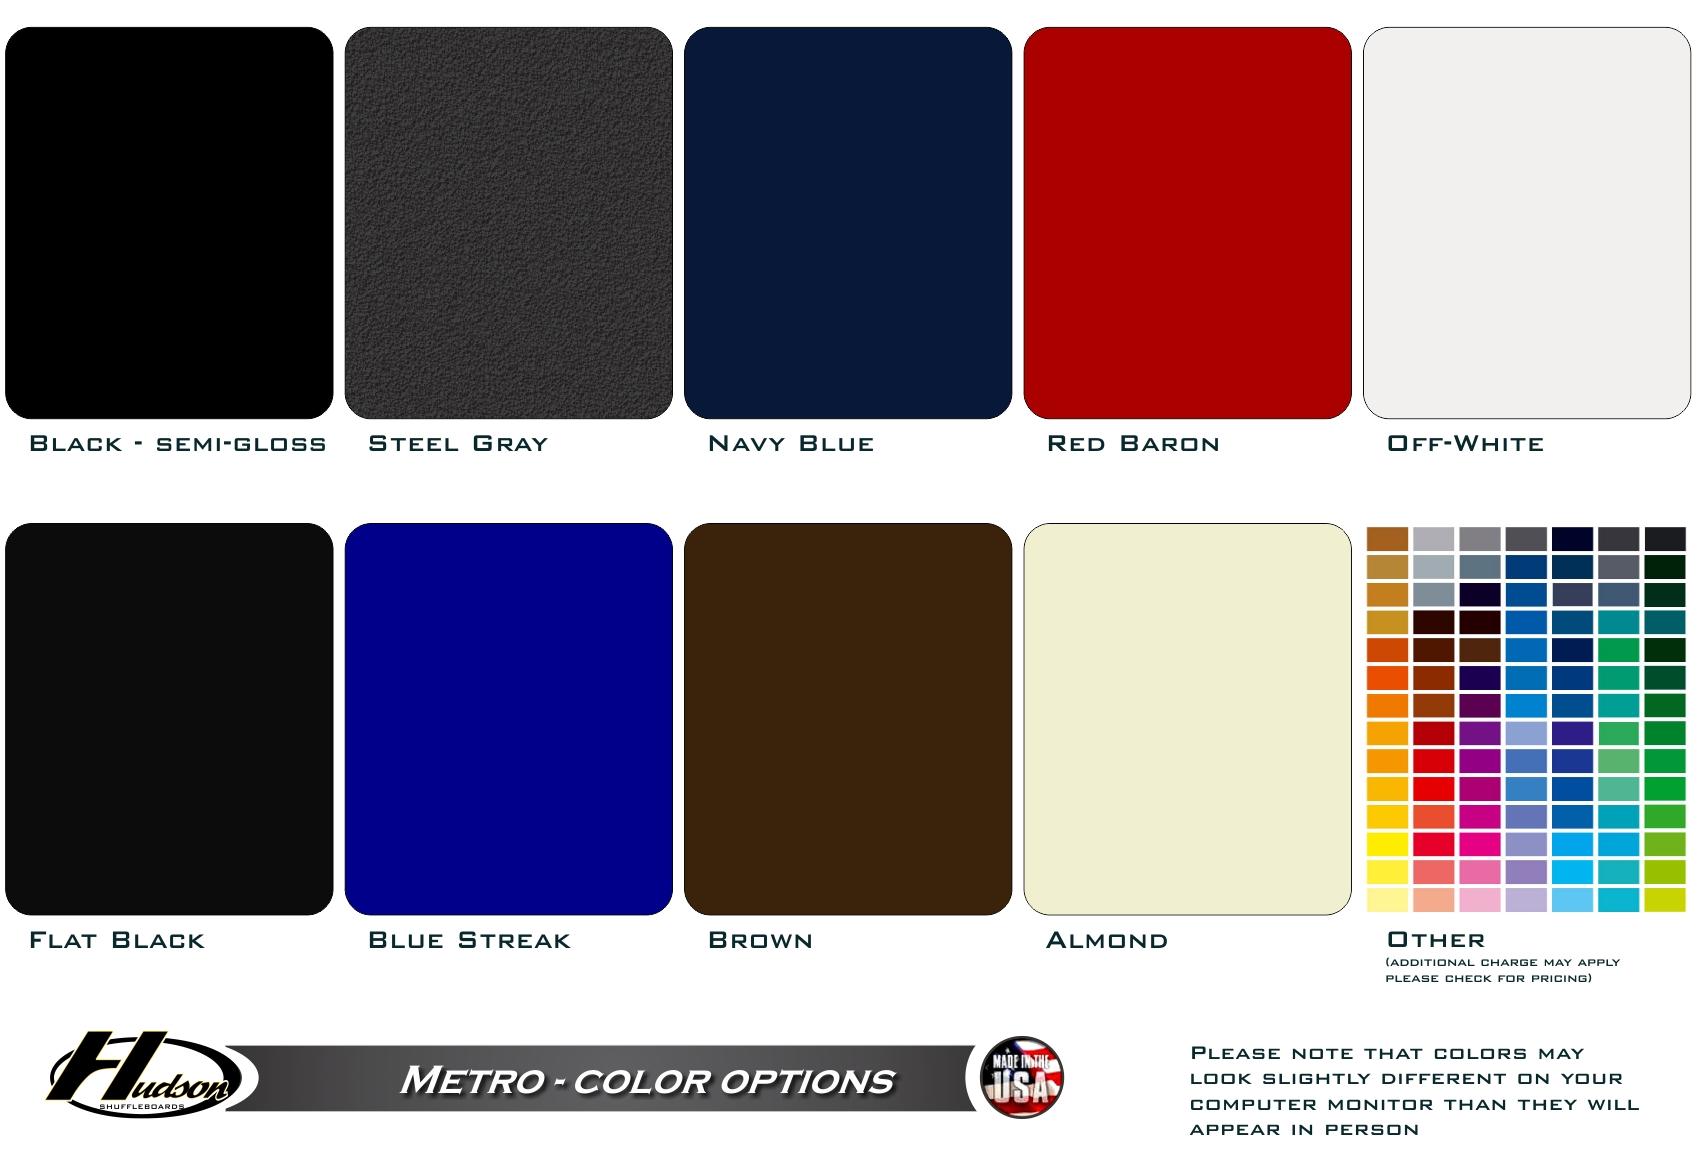 Metro Shuffleboard Color Options